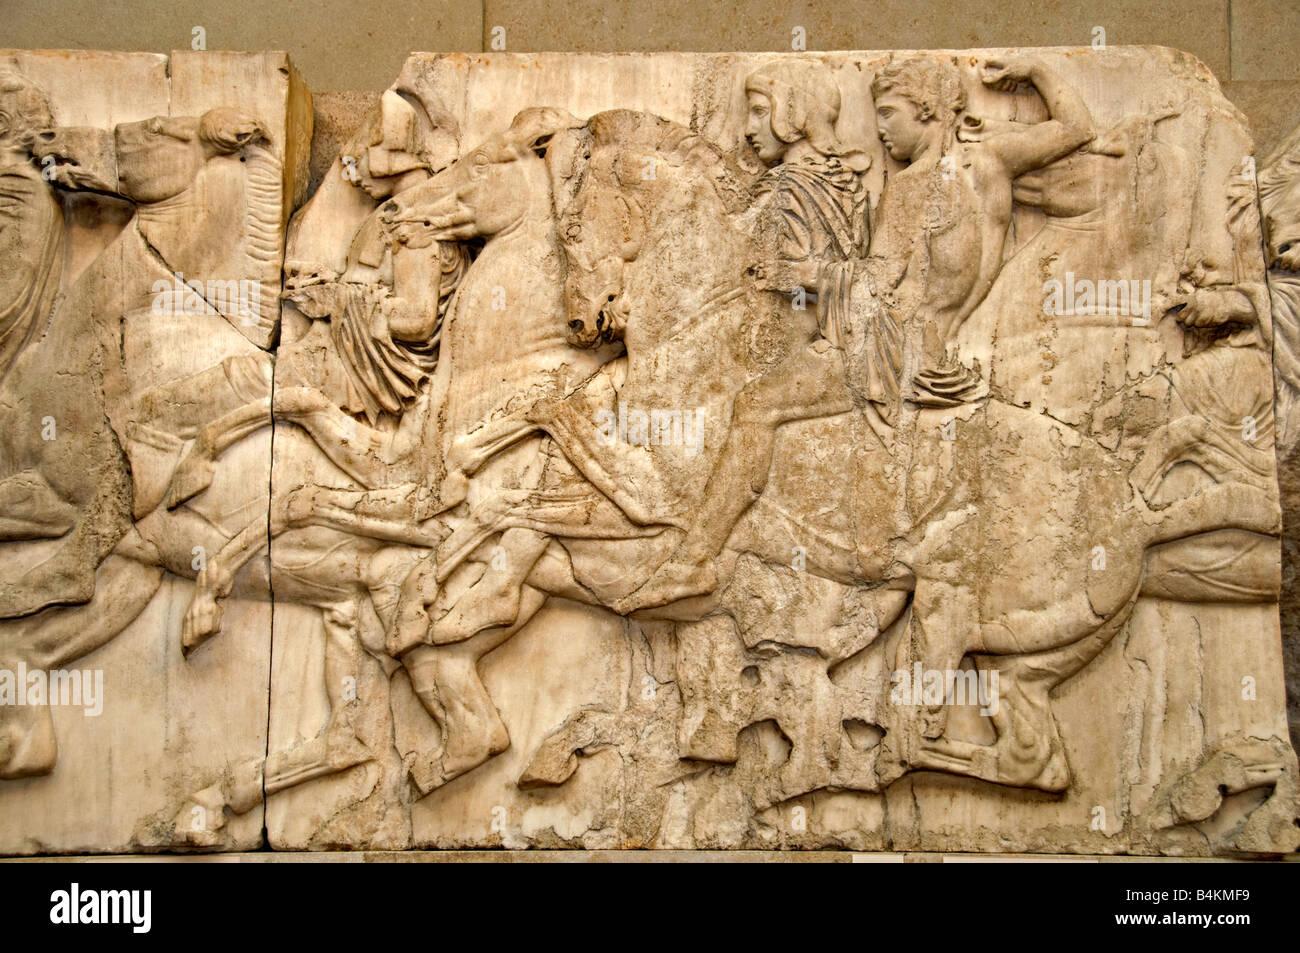 Horsemen Horseman Cavelary Chase Parthenon Pediment Metopes Frieze Greek mythology Greece Elgin Marbles Acropolis - Stock Image